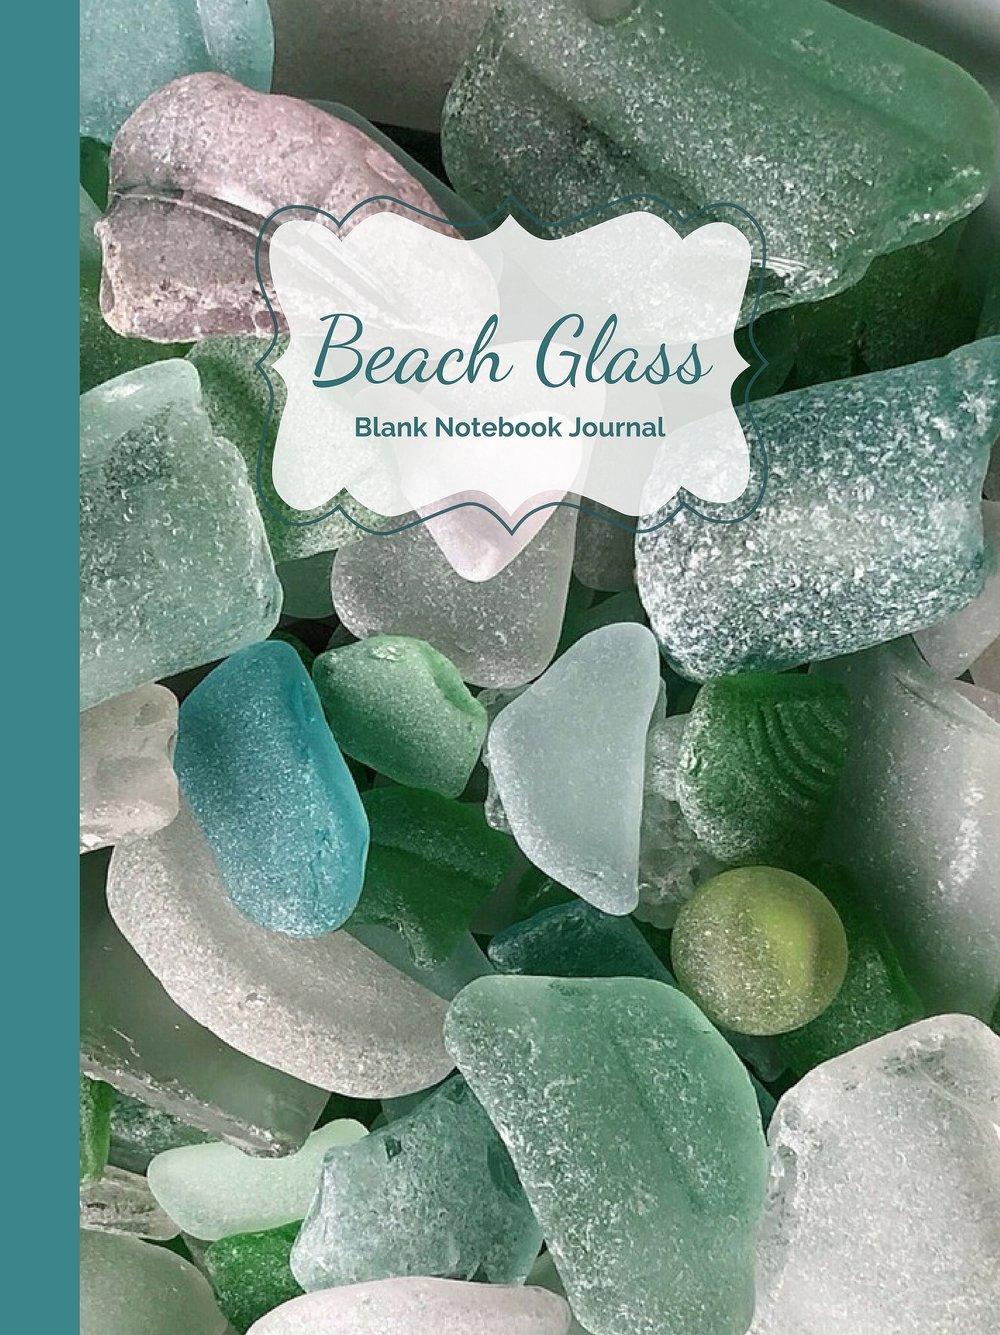 Beach Glass, Sea Glass & Beach Vibes- Blank Notebook